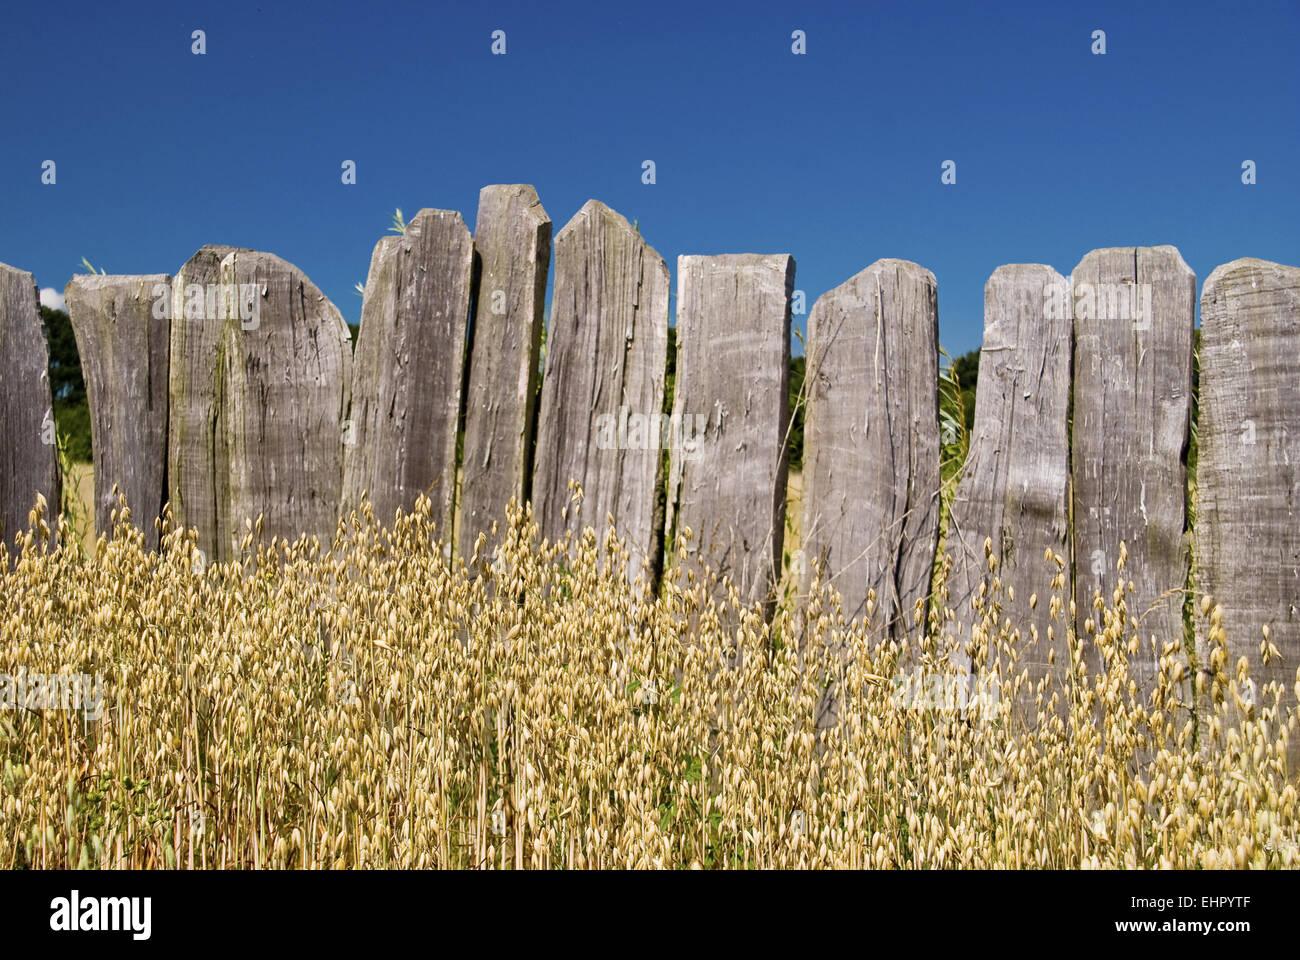 Cornfield - Stock Image